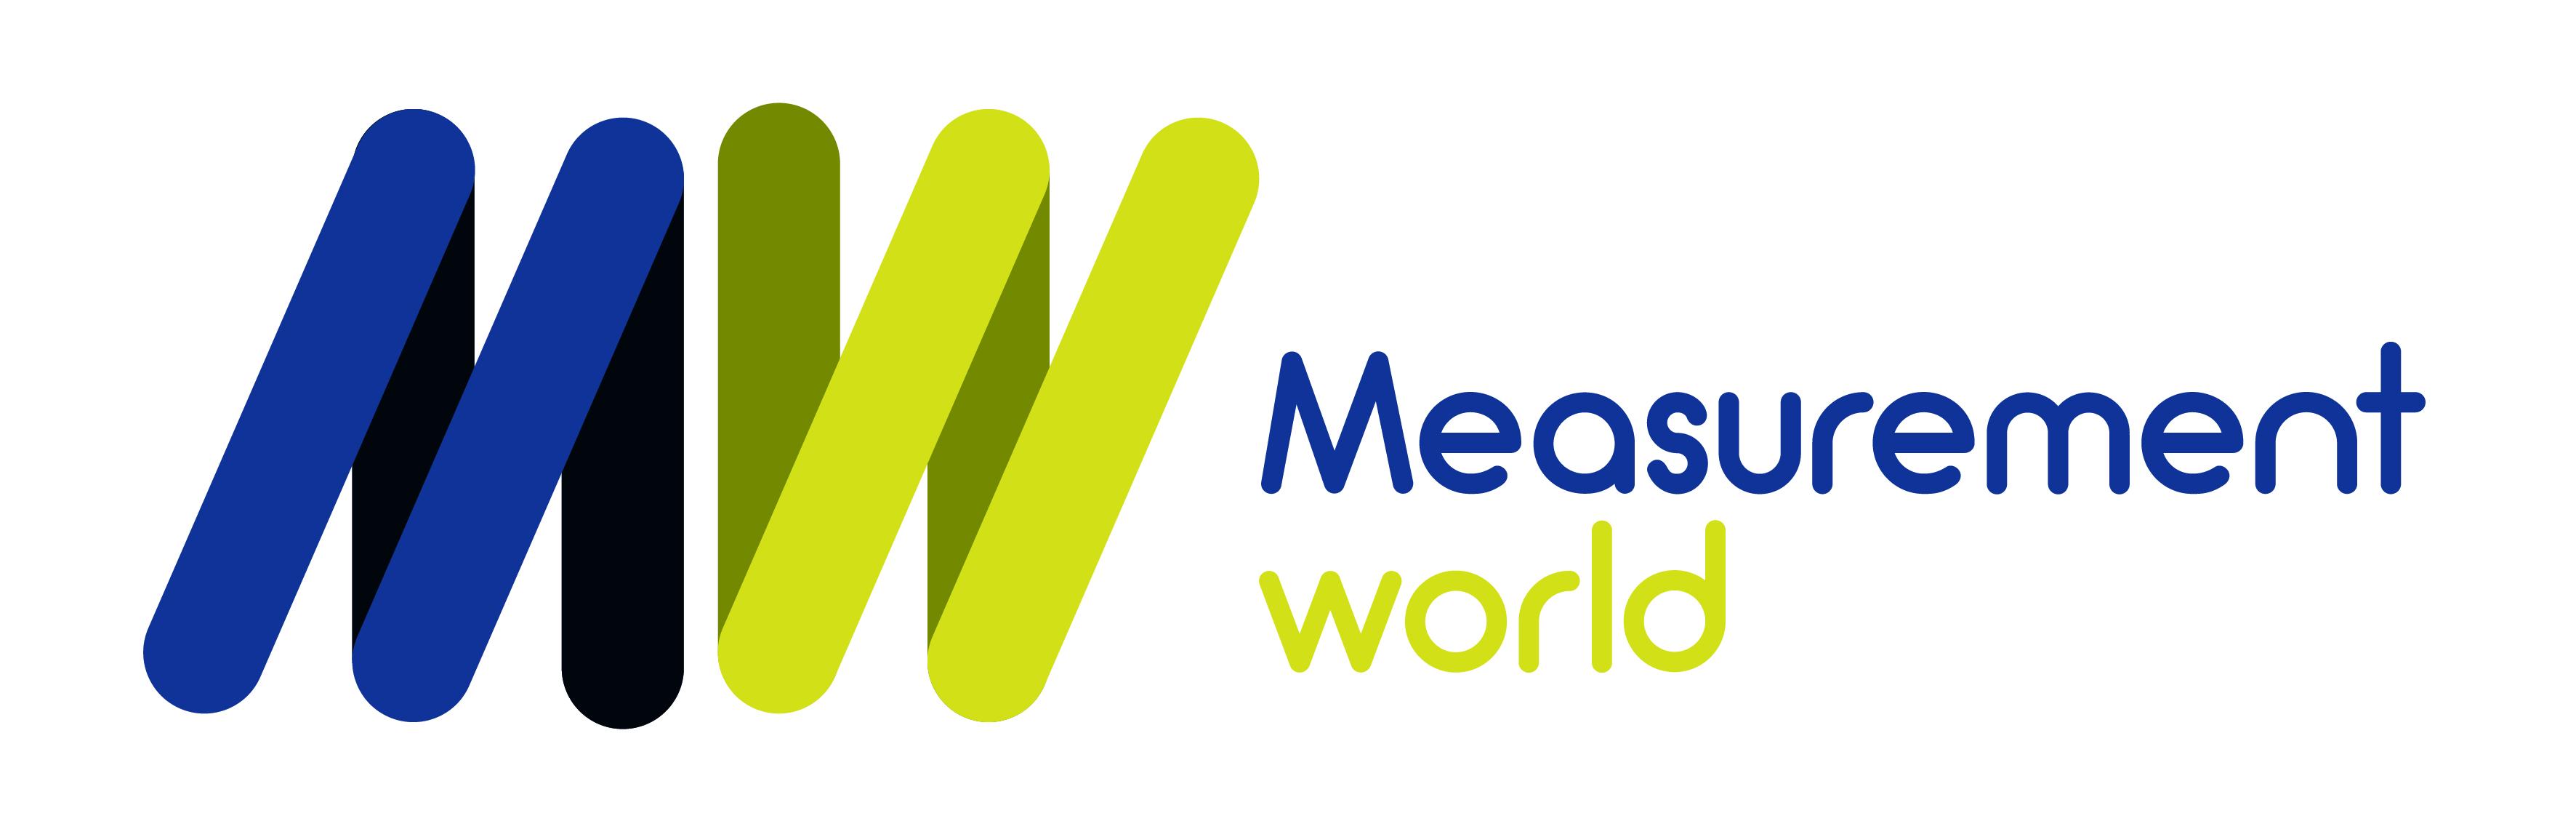 MEASUREMENT WORLD 2019